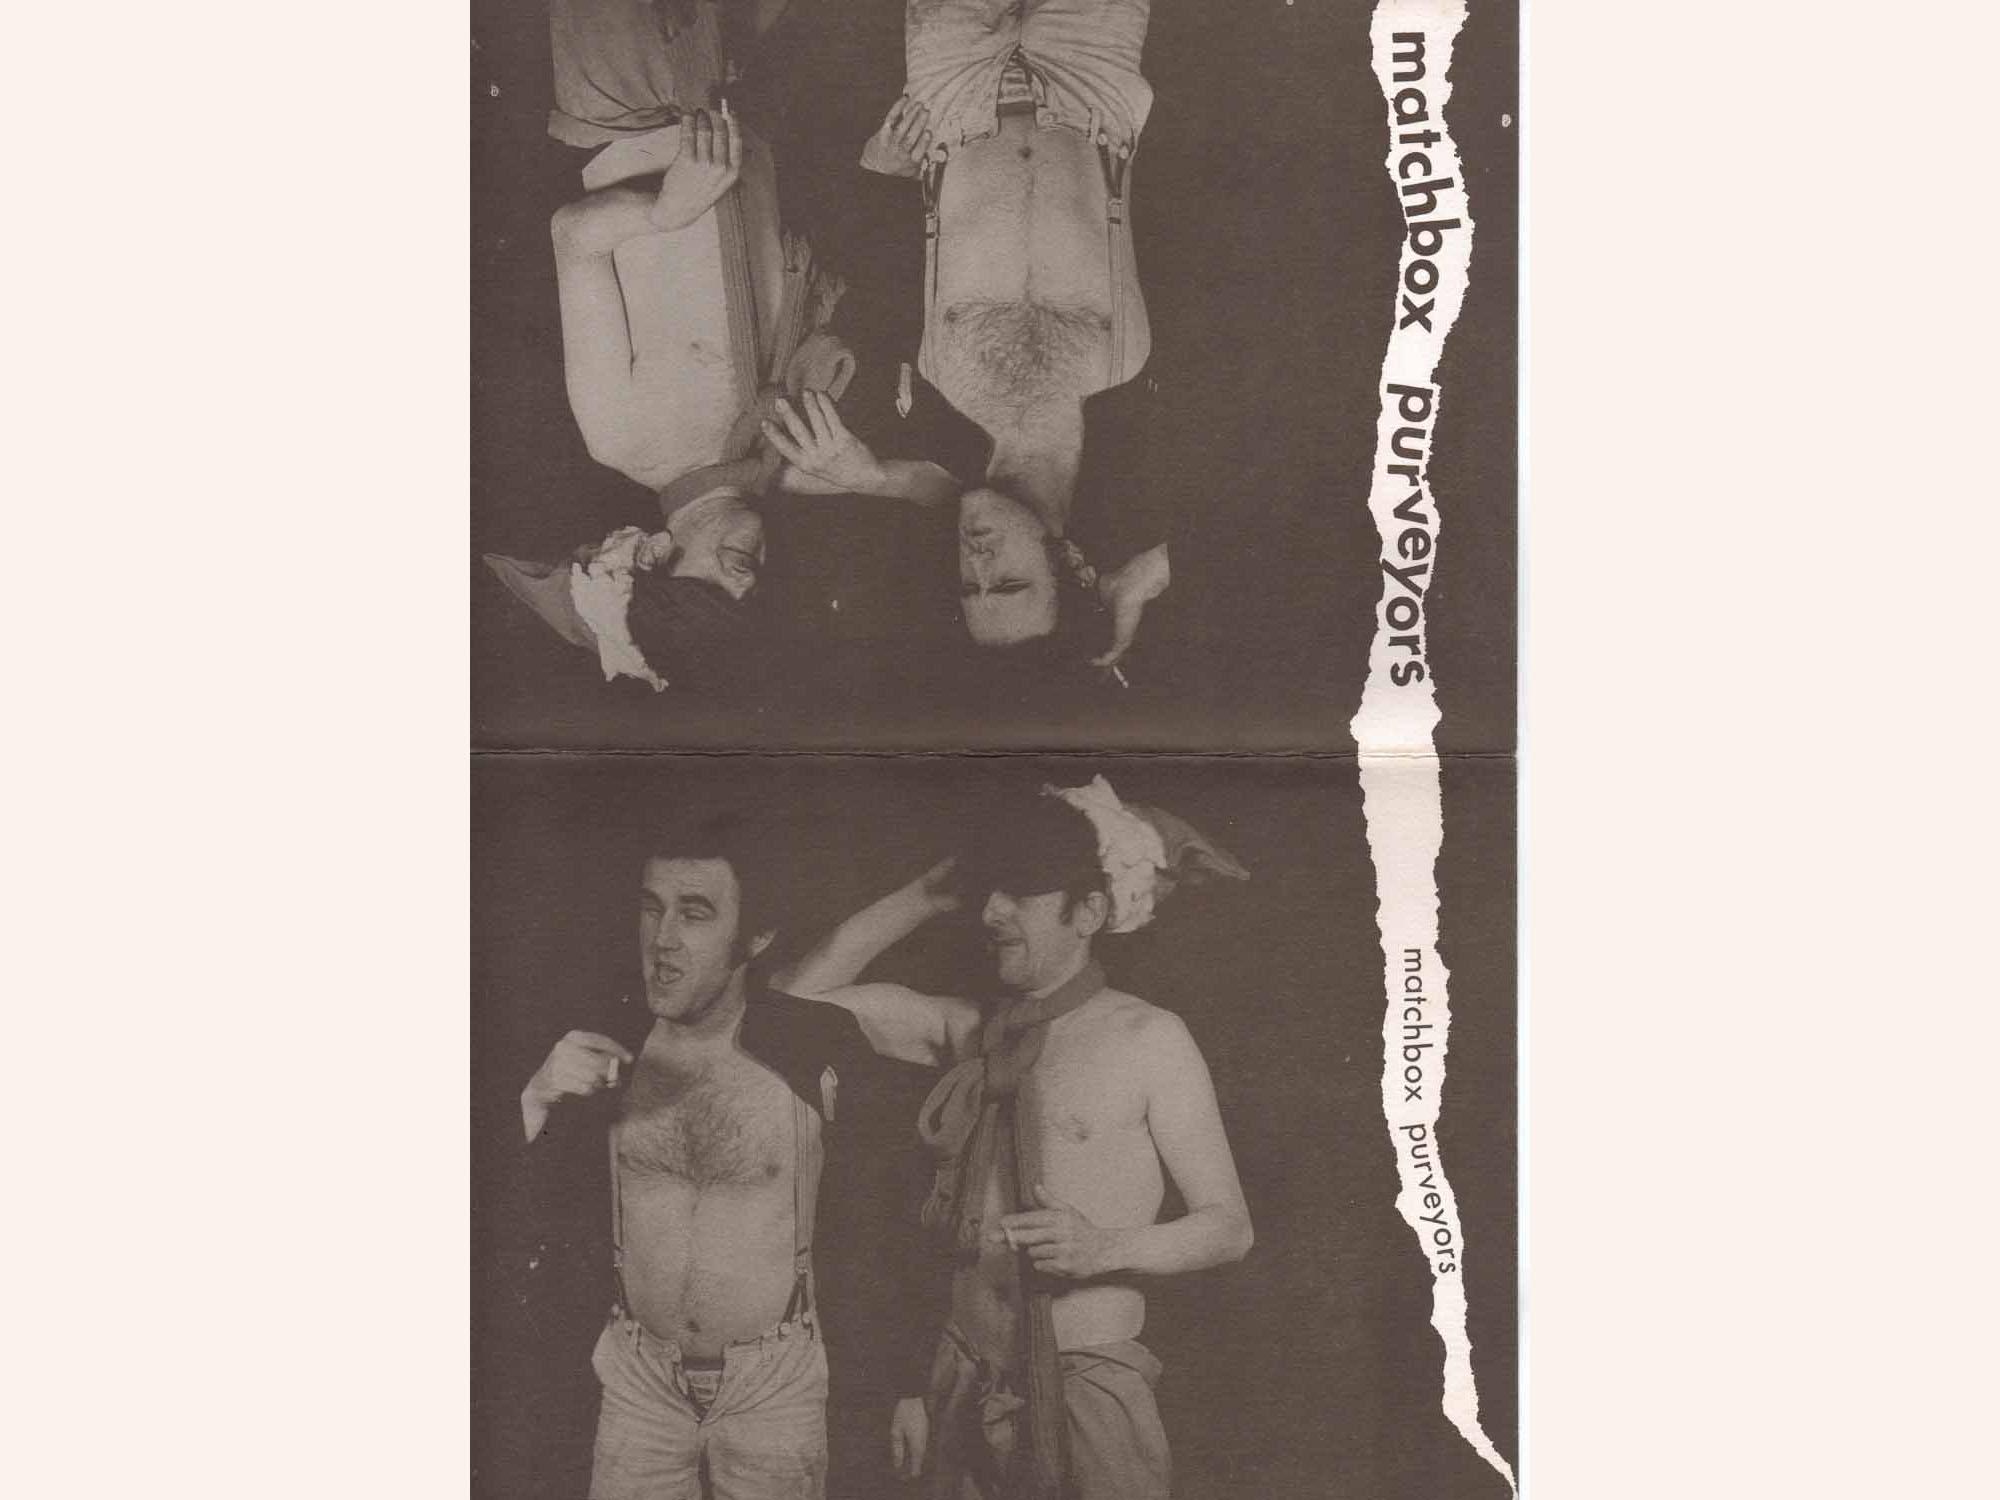 Ian Hinchliffe and Dave Stephens, (1970).